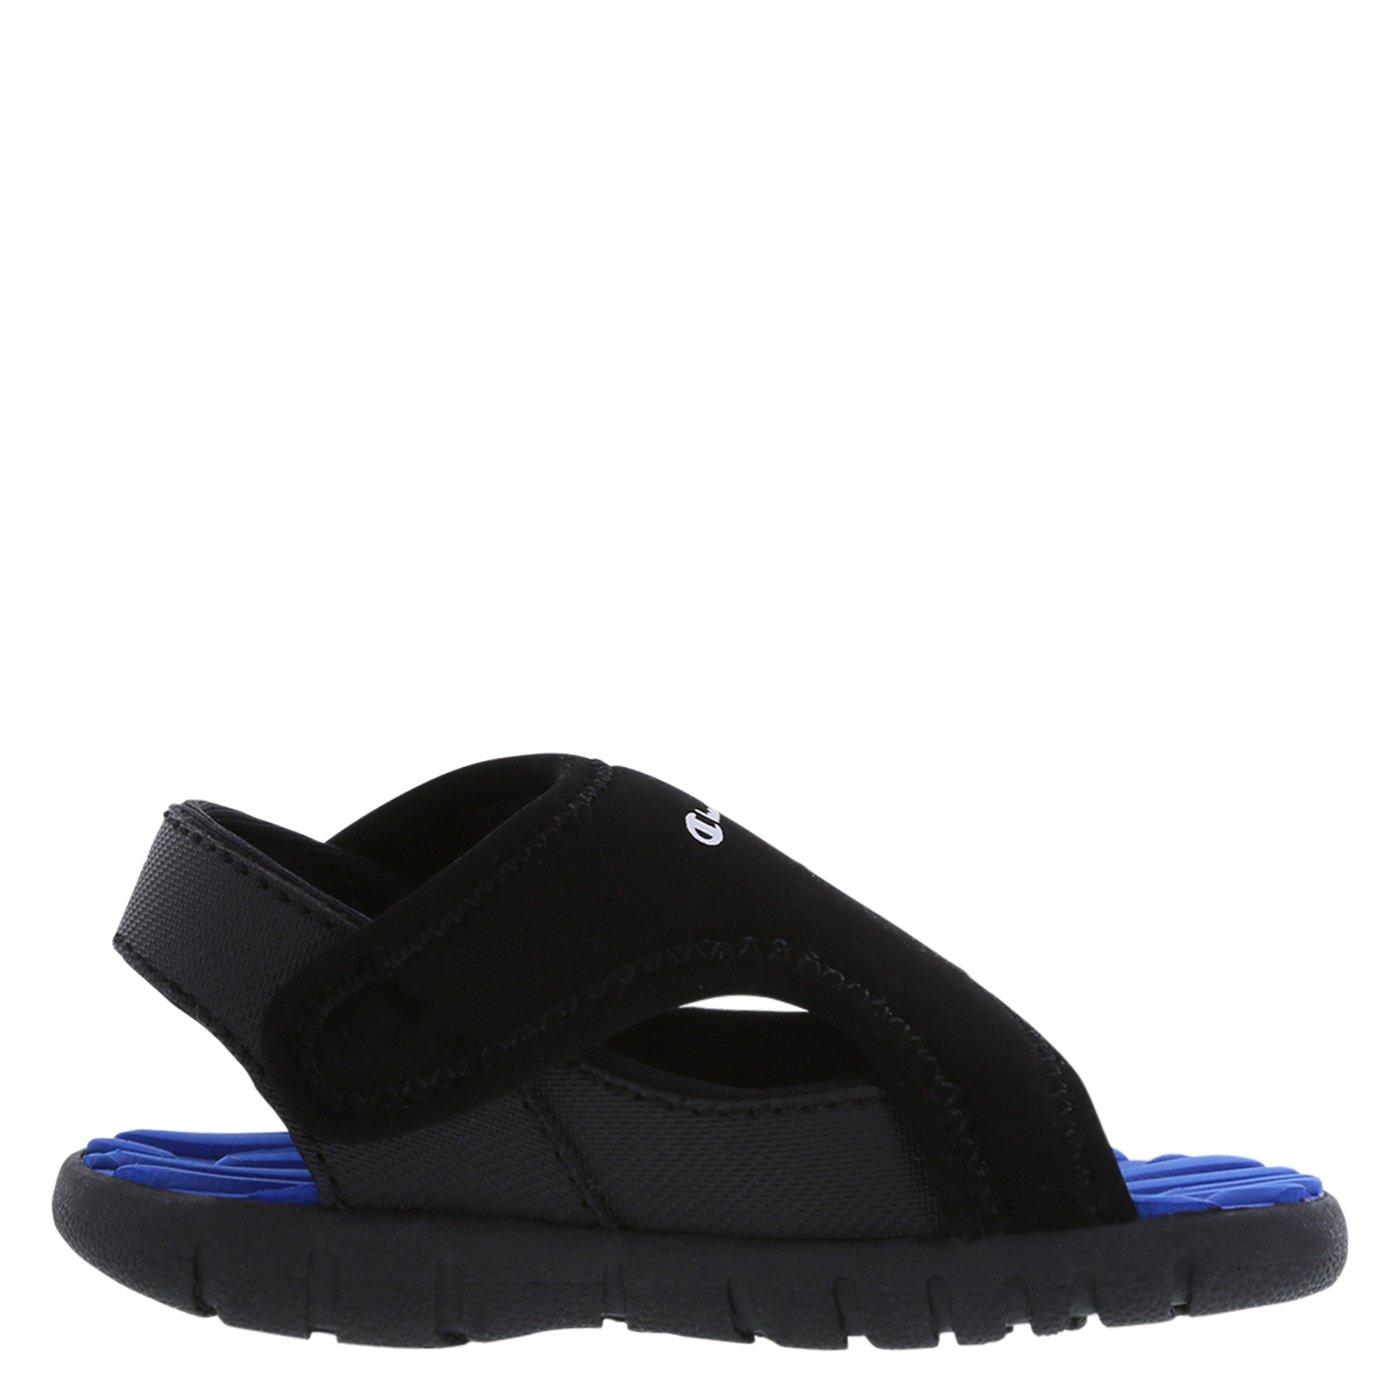 befcb18b42f Amazon.com  Champion Boys Black Blue Boys  Infant Splash Sandal 2 Wide   Shoes